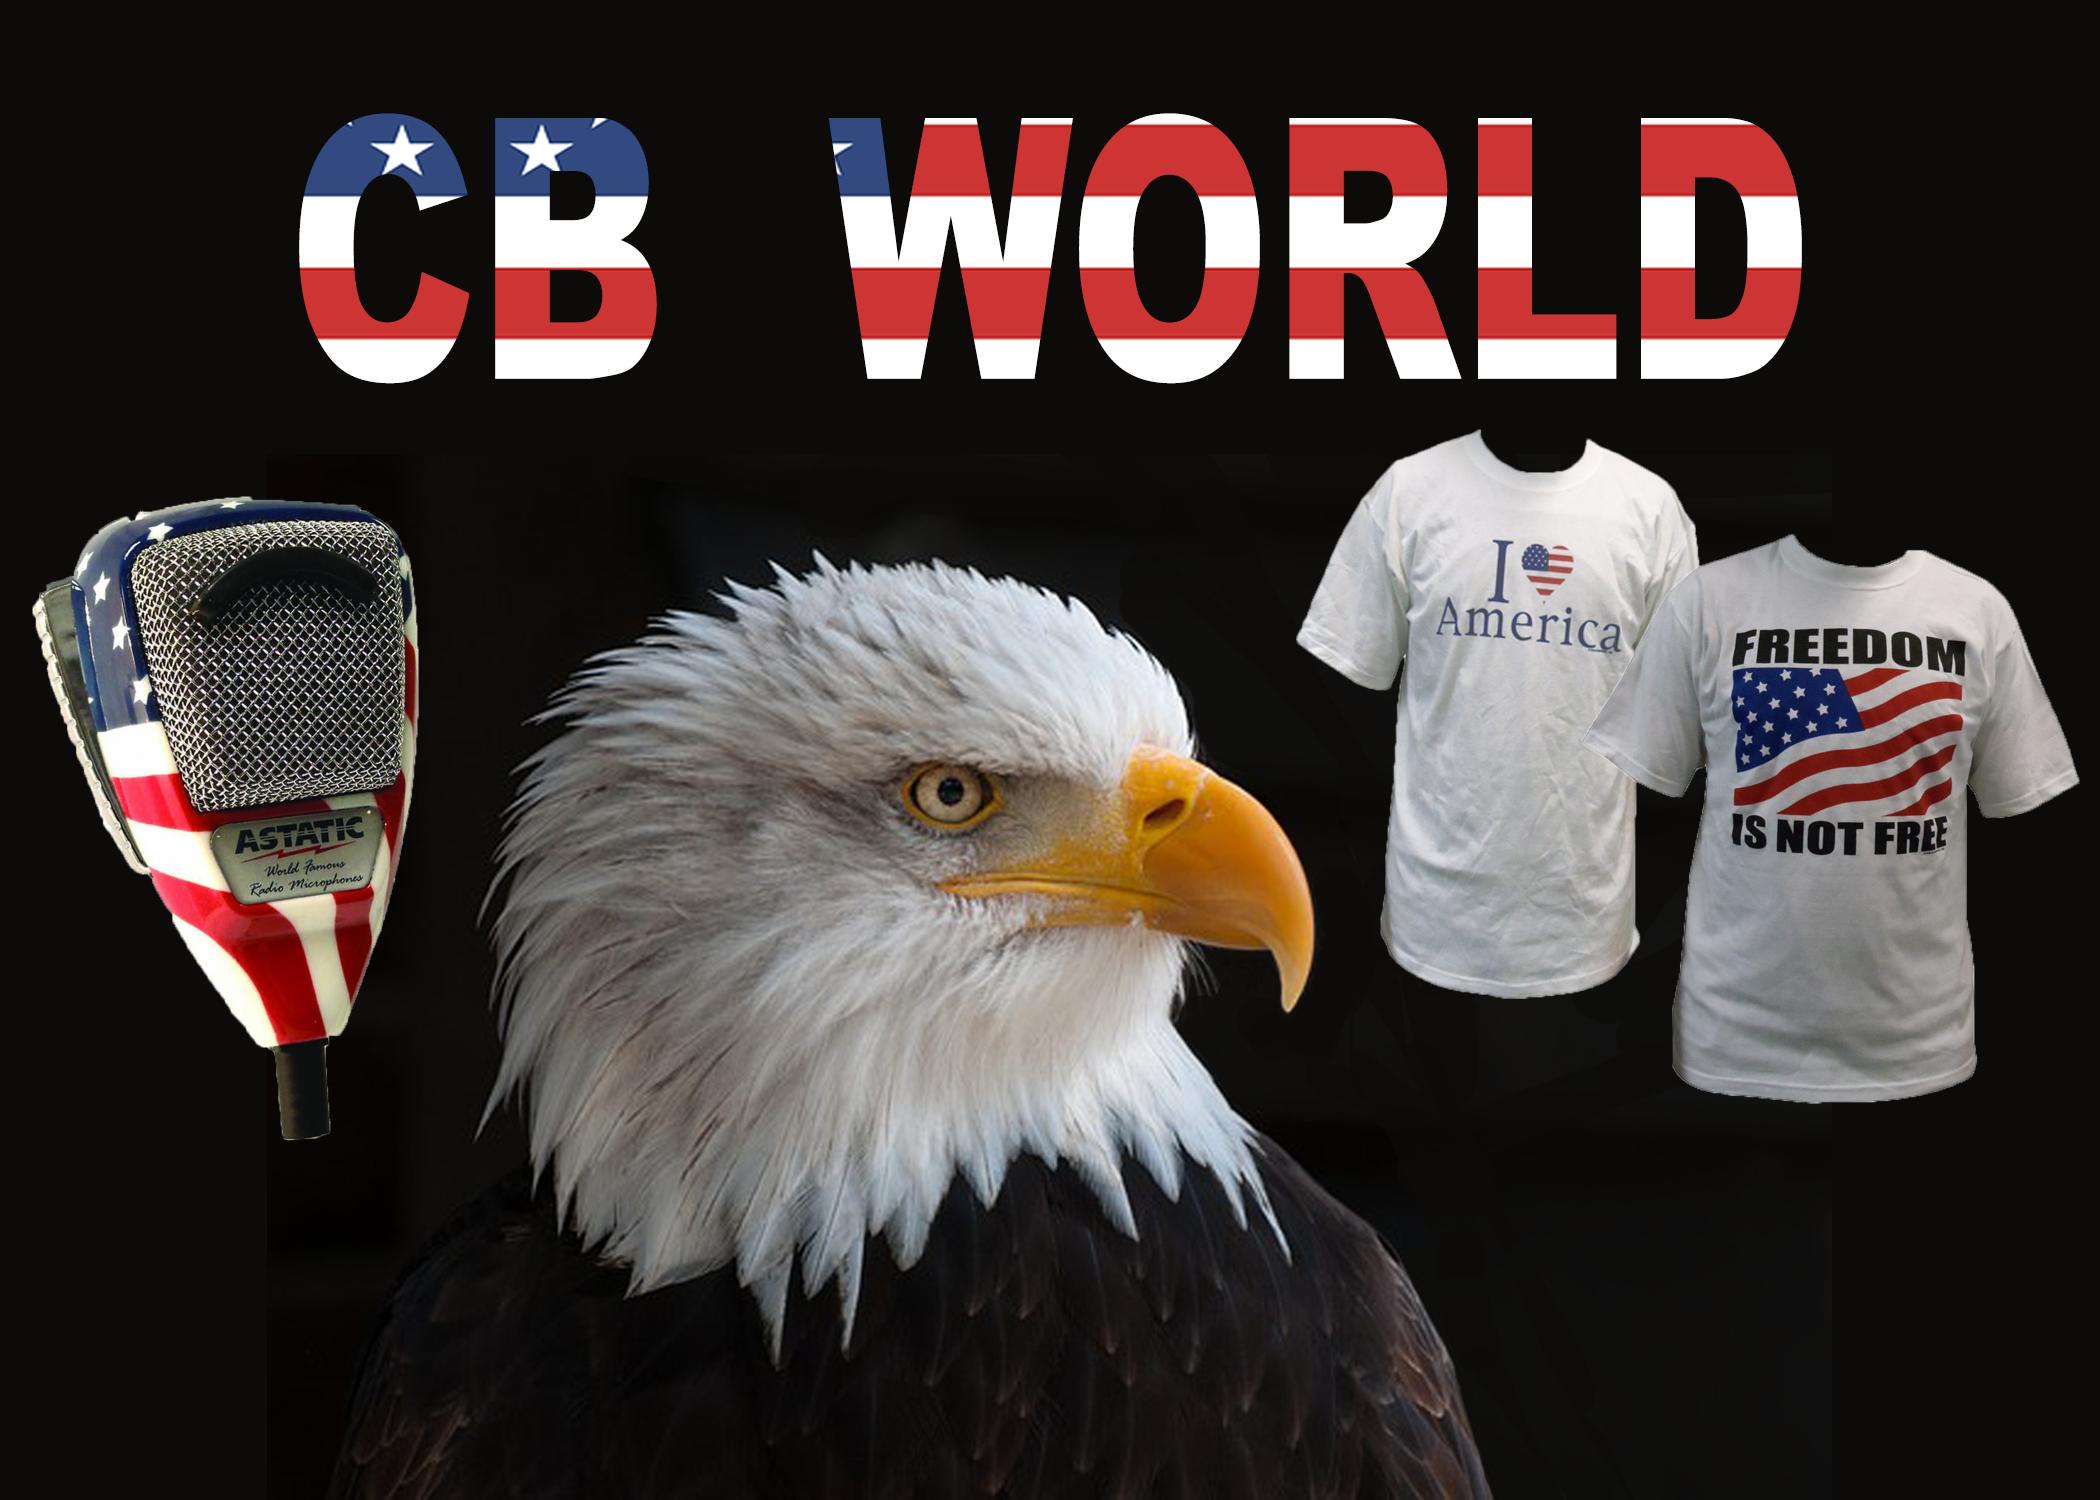 CB World Patriotism Products